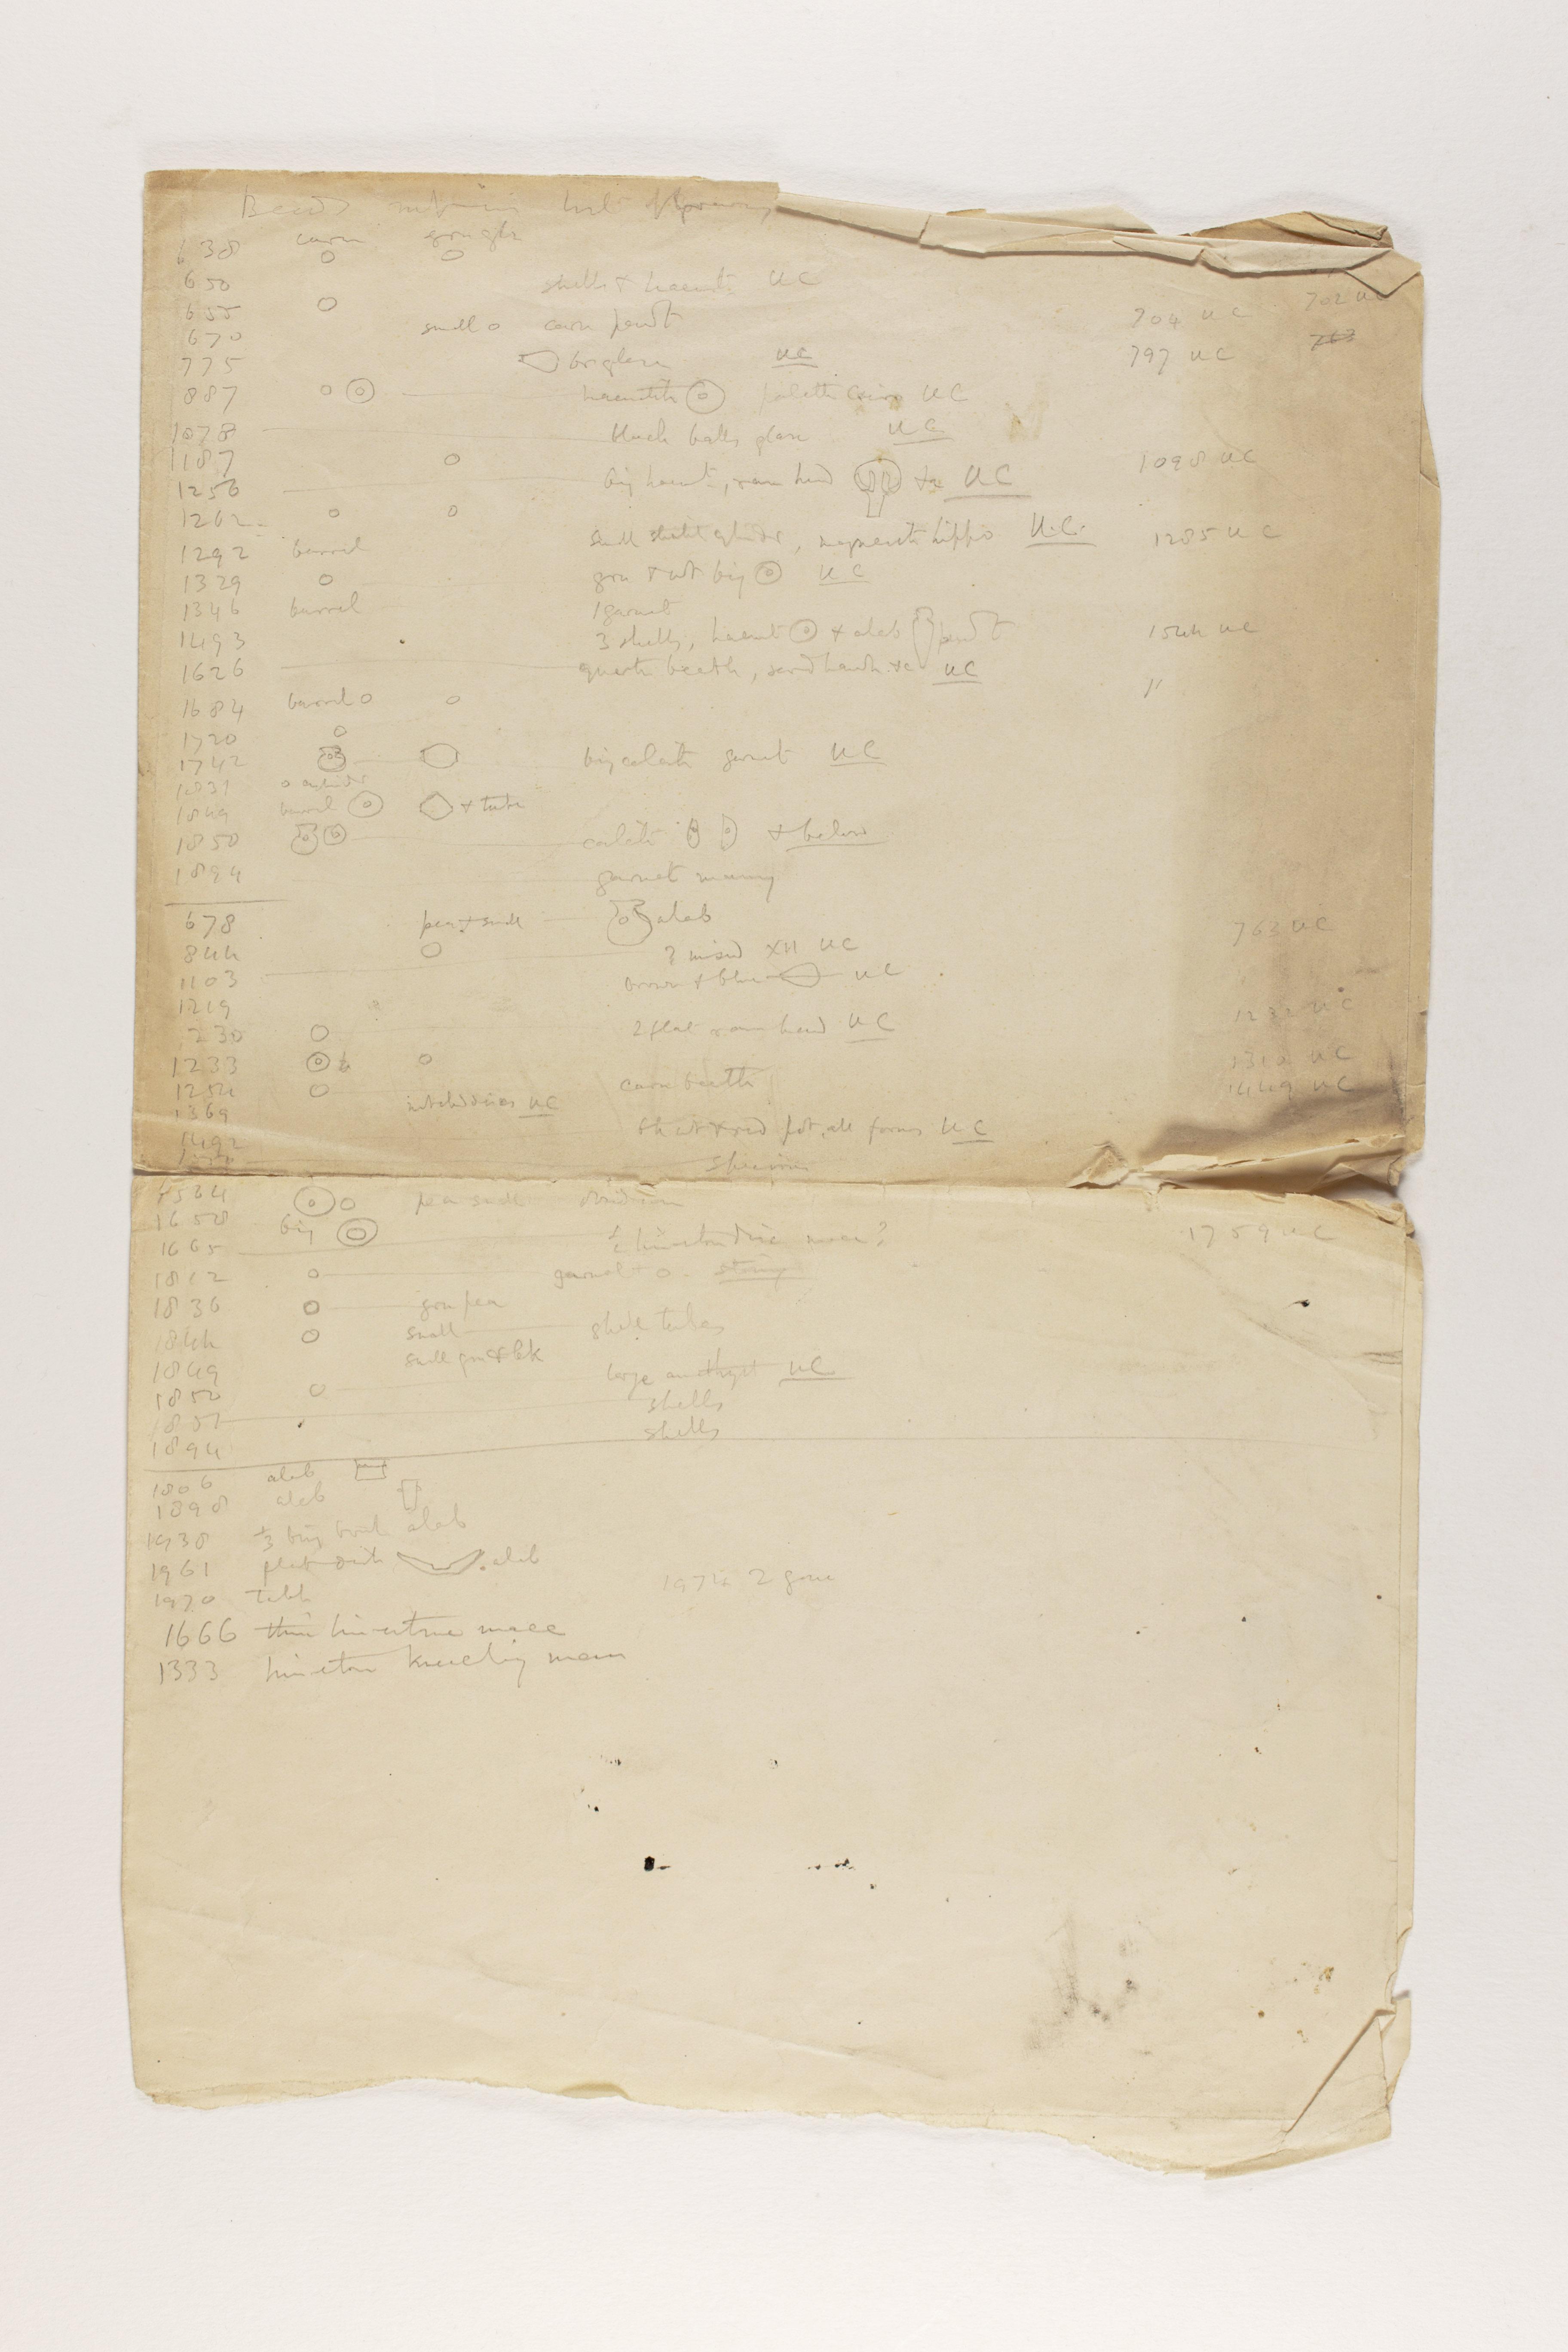 1912-13 Tarkhan, el-Riqqa, Memphis Object list PMA/WFP1/D/21/18.1